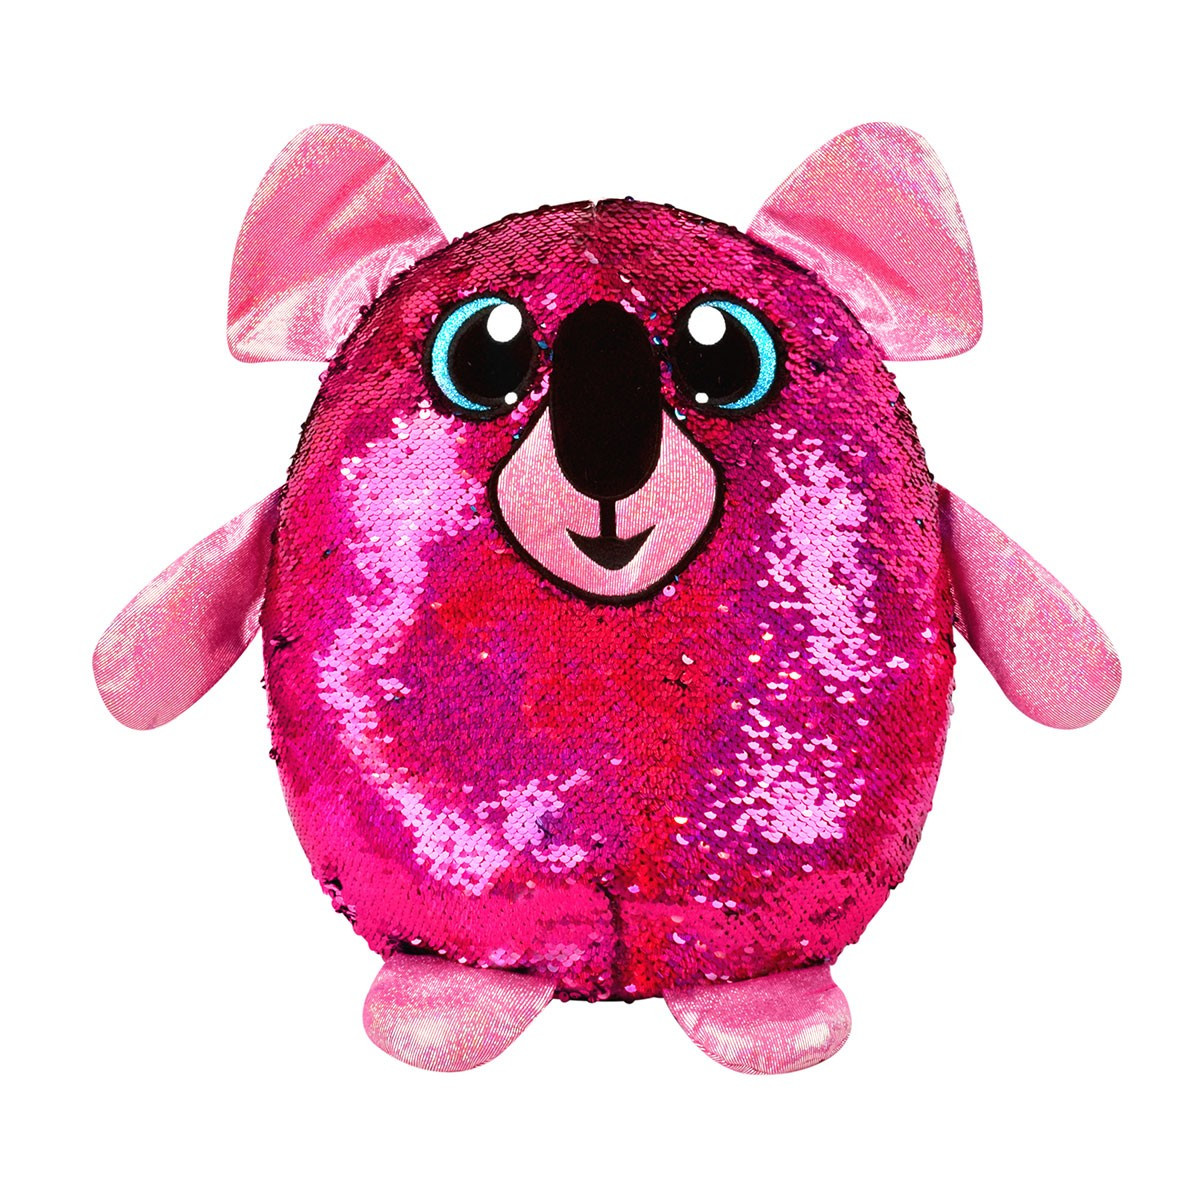 М'яка іграшка з паєтками SHIMMEEZ S2 - МИЛАЯ КОАЛА (36 см)